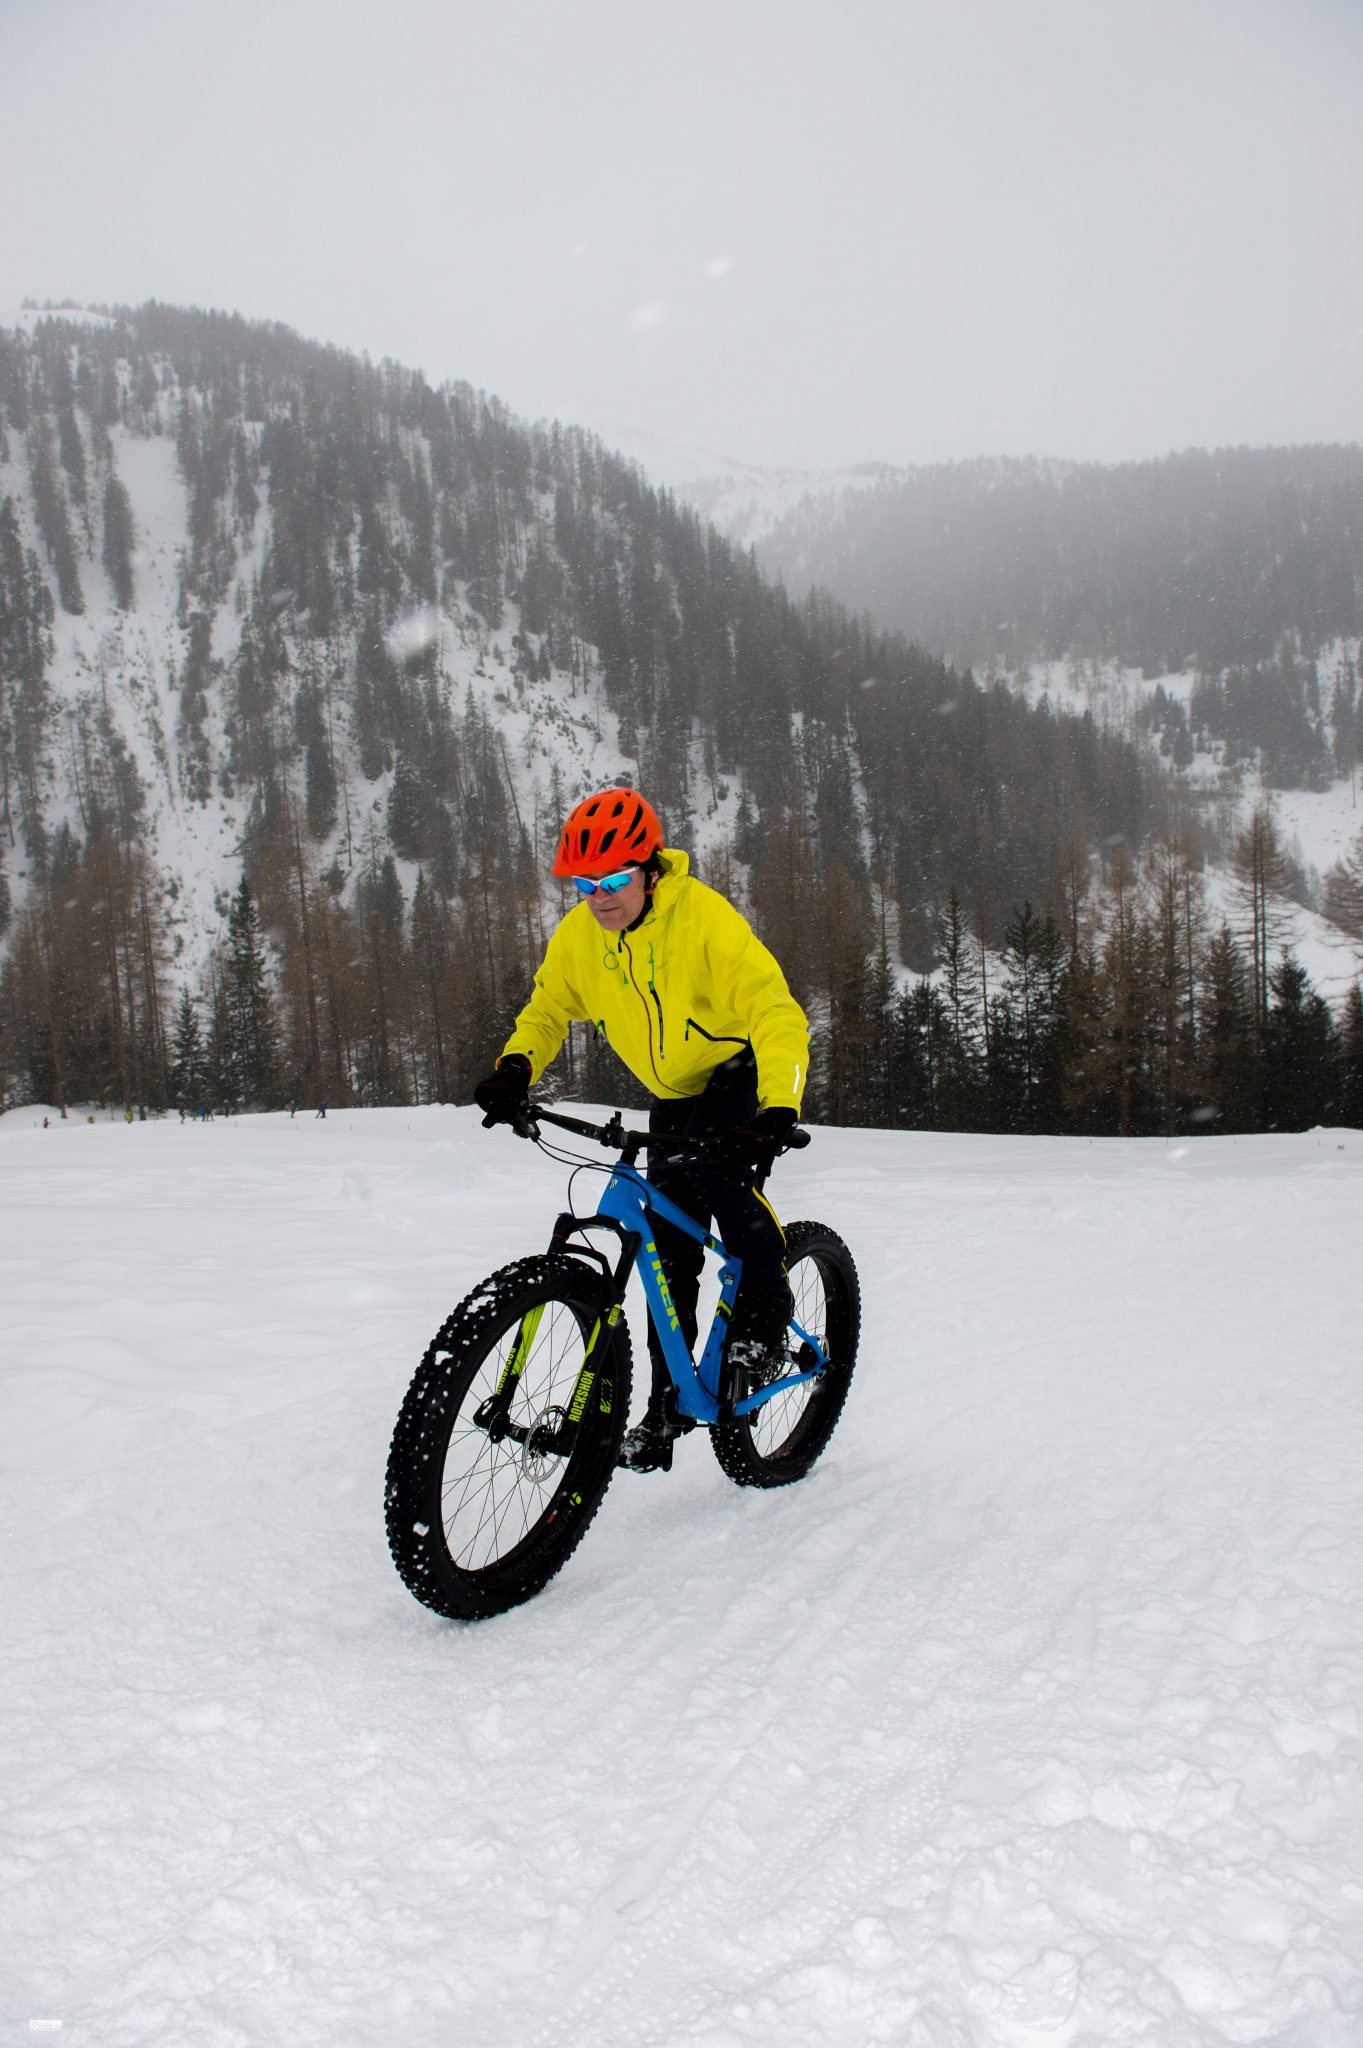 Twin-test hardshell winterjacks – Bontrager Lithos Stormshell versus Endura MT500 Waterproof II